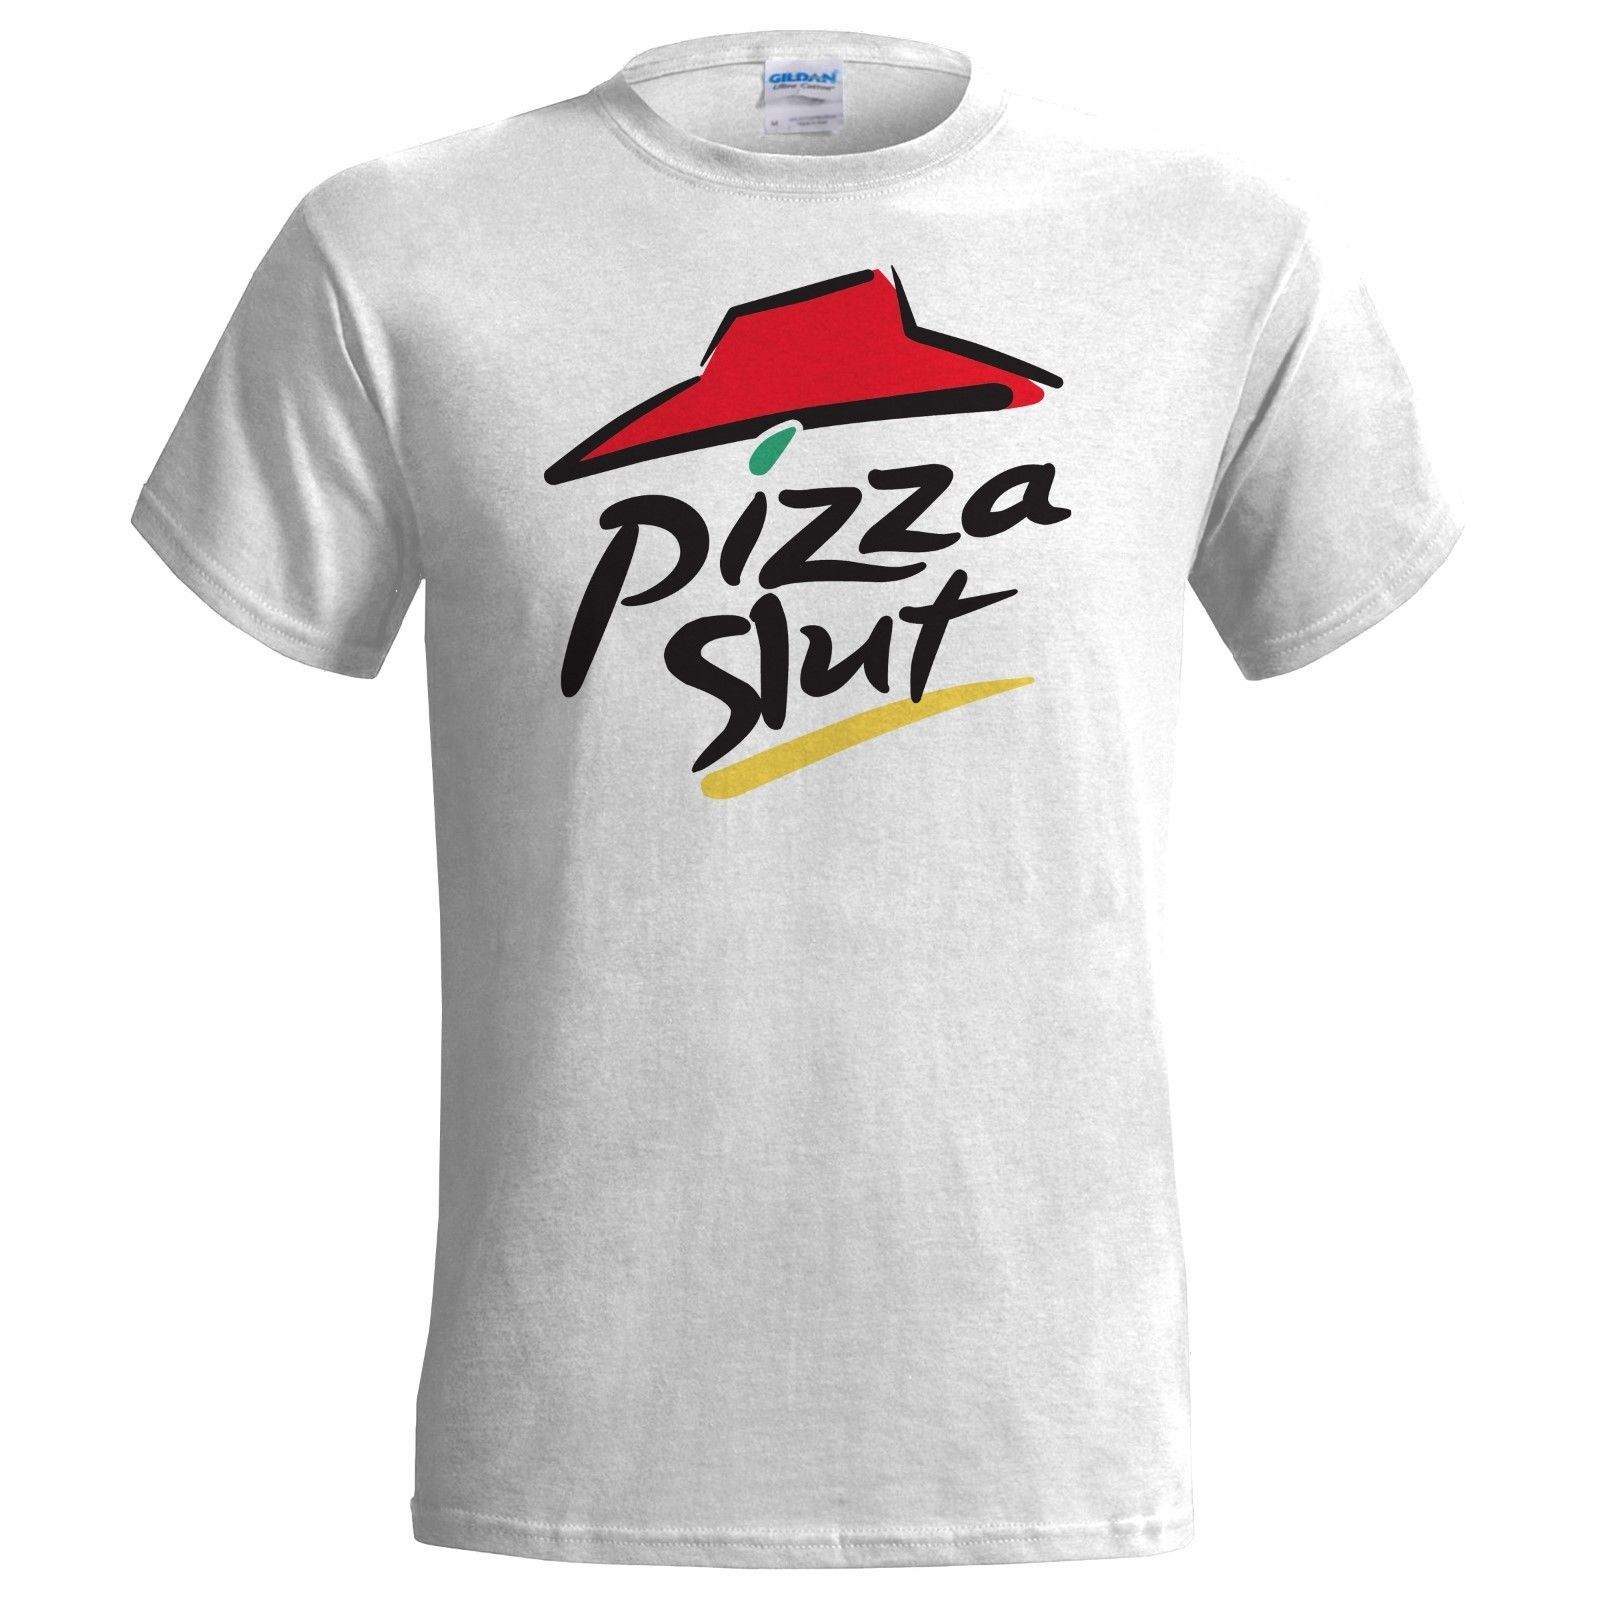 Buy PIZZA SLUT MENS FUNNY SPOOF T SHIRT PRESENT GIFT